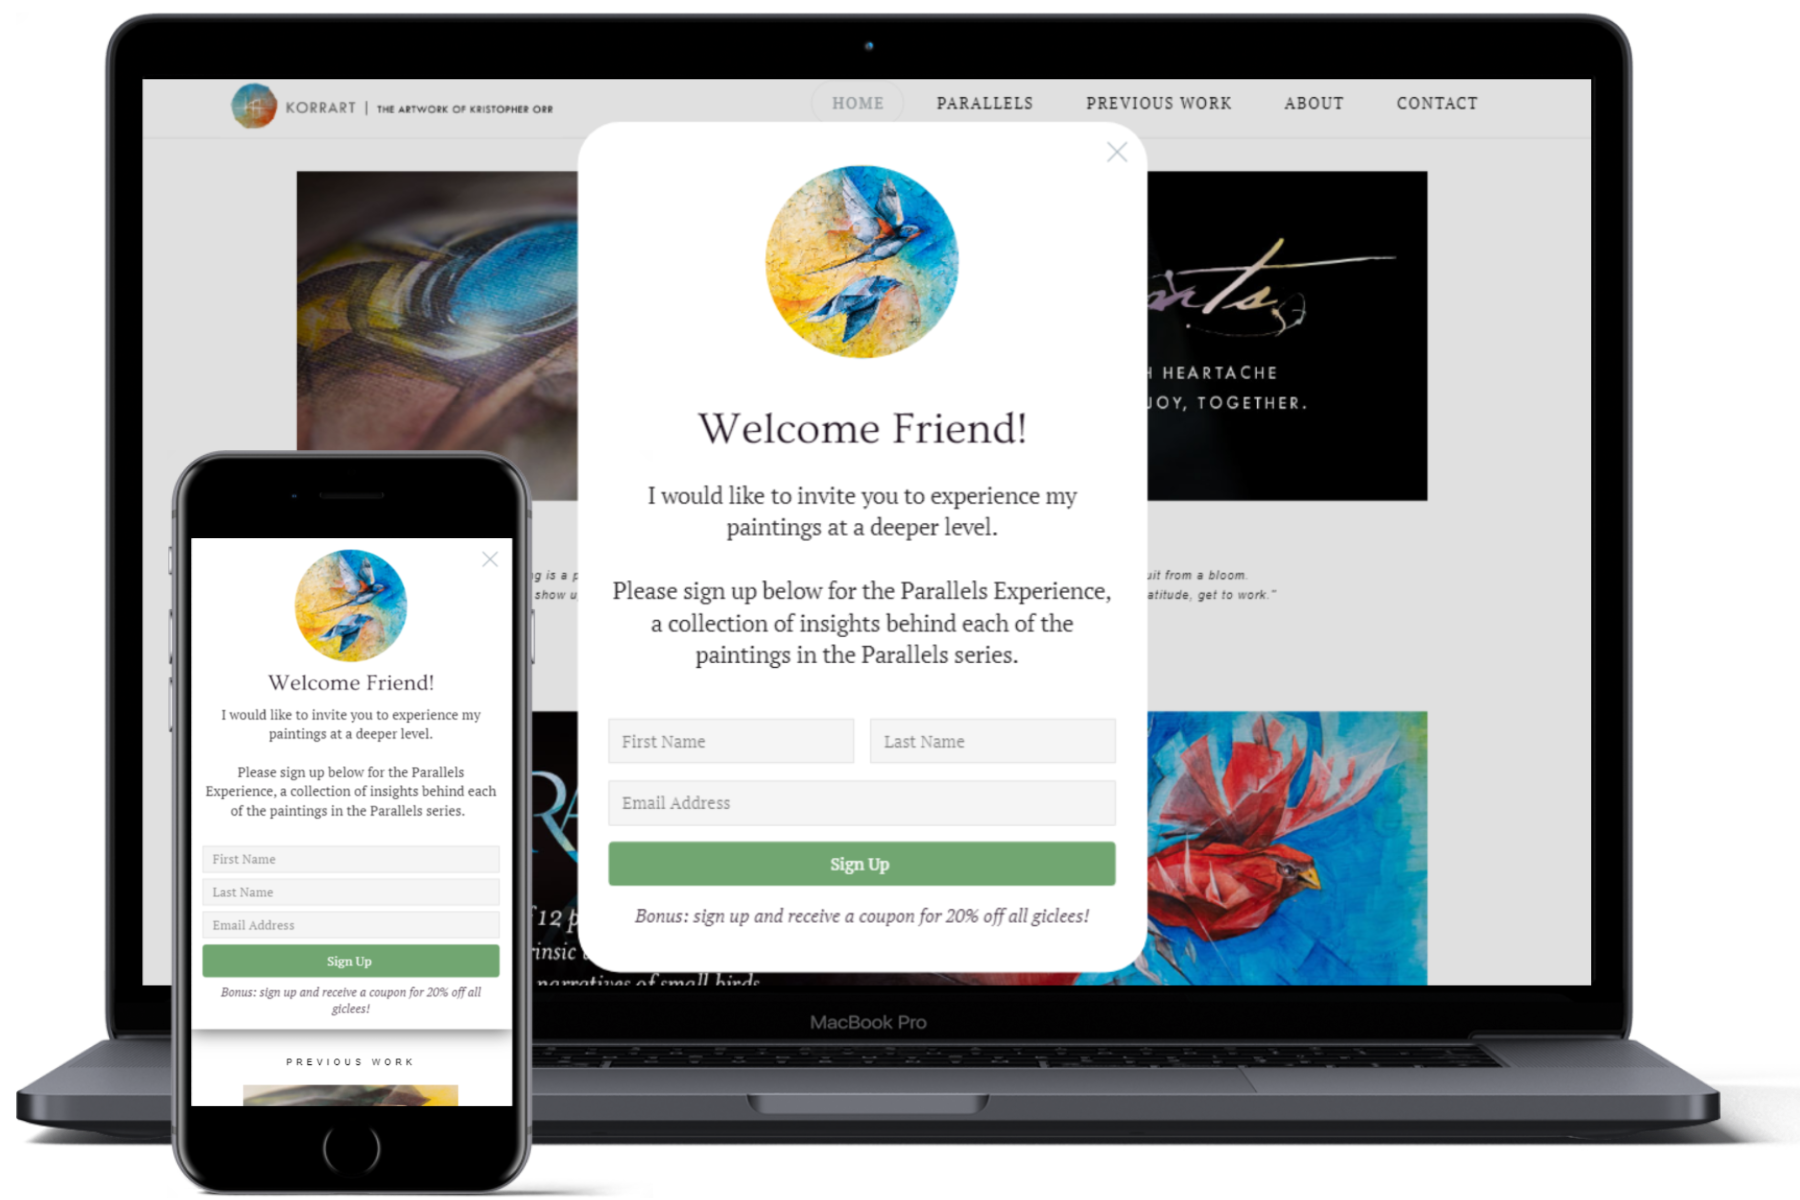 website showcase korrart